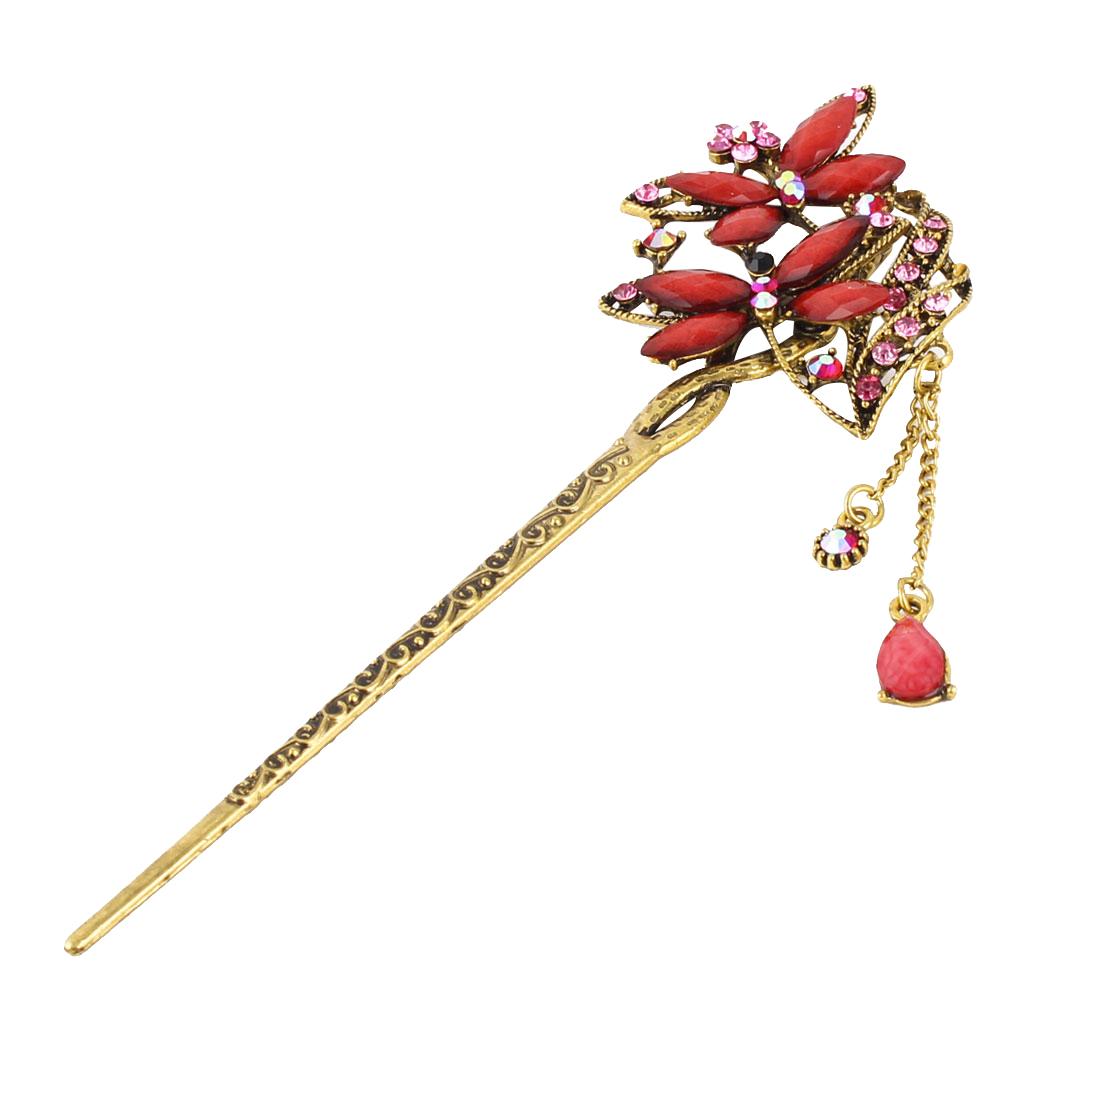 Lady Retro Dragonfly Flower Decor Caved Tassels Rrhinestone Hair Pin Pink